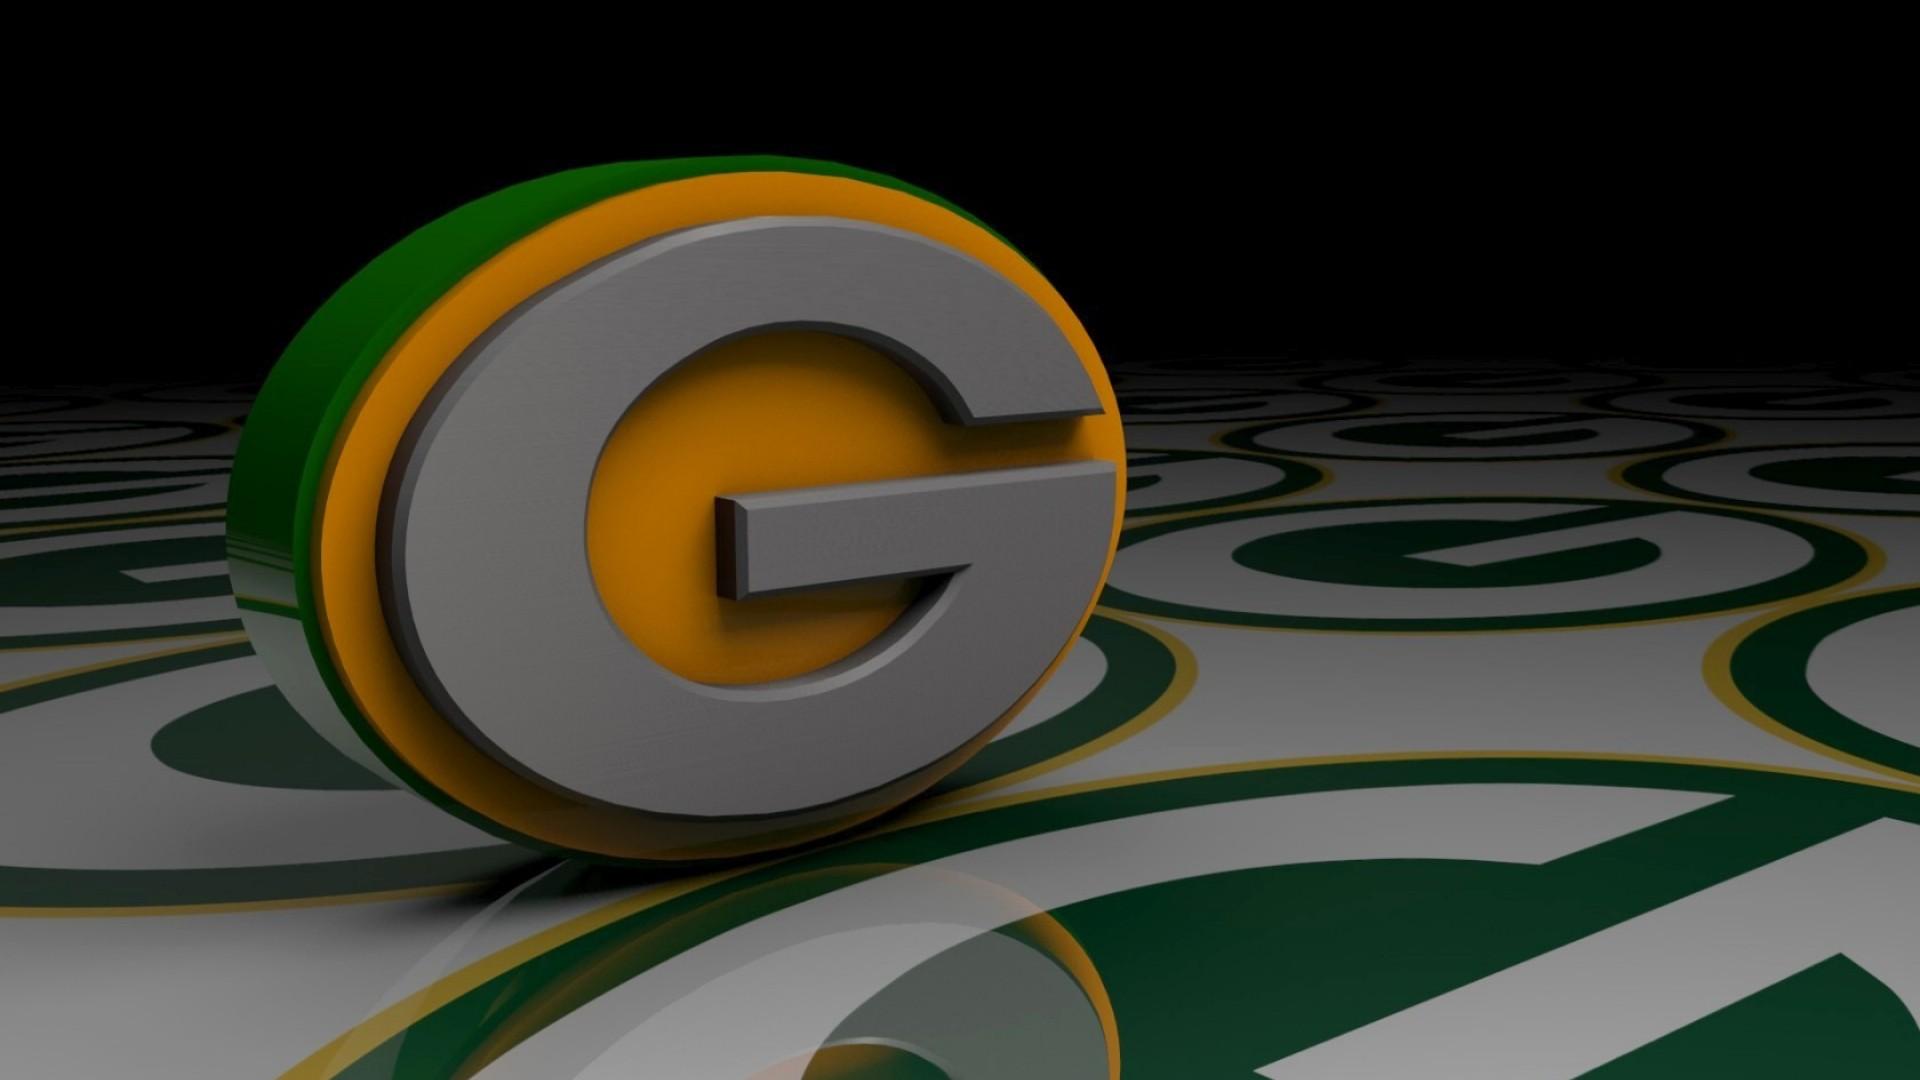 Free-Green-Bay-Packer-HD-wallpaper-wpc5805081